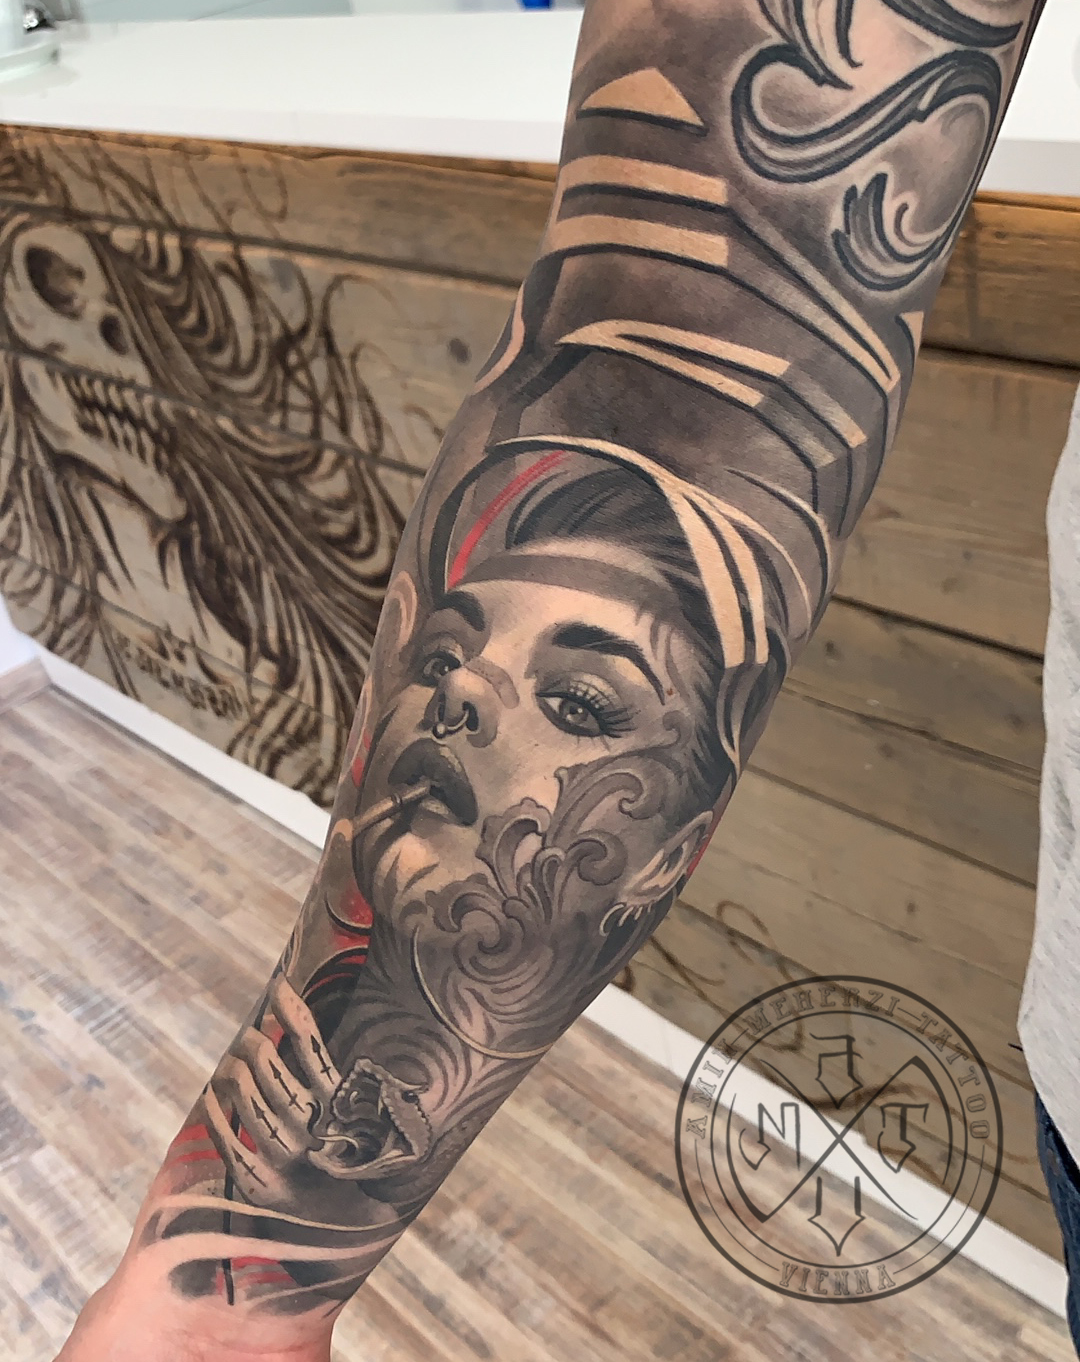 opus magnum wien vienna coverup coveruptattoo Tattoolife Tattoowork Tattoo Ink Worldofink Inkmaster Tattoogirl Tattooidea Tattoos Tattooworks Viennatattoo Tattoomagazine Tattooconvention Inkwork Realisictattoo Realisticink Tattooshop Blackandgrey Blackandgraytattoo Skin Skinartmag tattoorevuemag supportgoodtattooing sharonalday tattoocommunity tattooedlife tattooed inkedup tattooculture artwork tattooscout tattoodo tattoodobabes myworldofink  tattu tatu opusmagnumtattoo killerink besttattoo besttattooing bestoftattooink tattooing mastertattoo mastertattooing mastertatu mastertattooer tattooer besttattooever bestinktattoo besttattooartist  tattooartist reasliticartist realistictattooartist tattooingartist  inkartist awsometattoo awsomtattooartist awsomtattooartists awsomtattooing awsomink awsomtattoorealistic awsomtattoohyperrealistic nicetattoo nicetattooart nicetattoowork nicetattooink nicetattooart famoustattoo famoustattooart famousartwork famostattooartist goodtattooing goodtattoos goodtattoorealistic tattooconvention inportainttattoo importainttattooart importainttattoowork importaintartist importantrealistictattoo importainttattooing tattoogun amintattoo aminart aminmeherzitattoo amintattooartist amin aminartist meherzitattoo aminmeherzi 1150wien schweglerstaße skintattoo tattoooftheday tattoooftheweek tattooofthejear tattooprice tattooinfinity tattoos tattooblack tattooapointment tattooaustria usatattoo lining liningtattoo insta instagram facebook fb projecttattoo project love fun progressing progress artofopusmagnum artofopus artofmagnum sullen sullentattoo sullenart sullenink worldfamousink killerinktattoo killerink killerinkamin shading shadingtattoo  sullen sullenfamily girlswithtattoo boyswithtattoo inkedman inkedboy inkedgirl design style tattoostyle lovemyjob lovetattoos wowtattoo realism realismtattoo realismtattooart silverbackink silverbacktattoo silverback tattooartgallarie gallerie galleri pritty prittytattoo prittytattooidea prittytattooing fresh